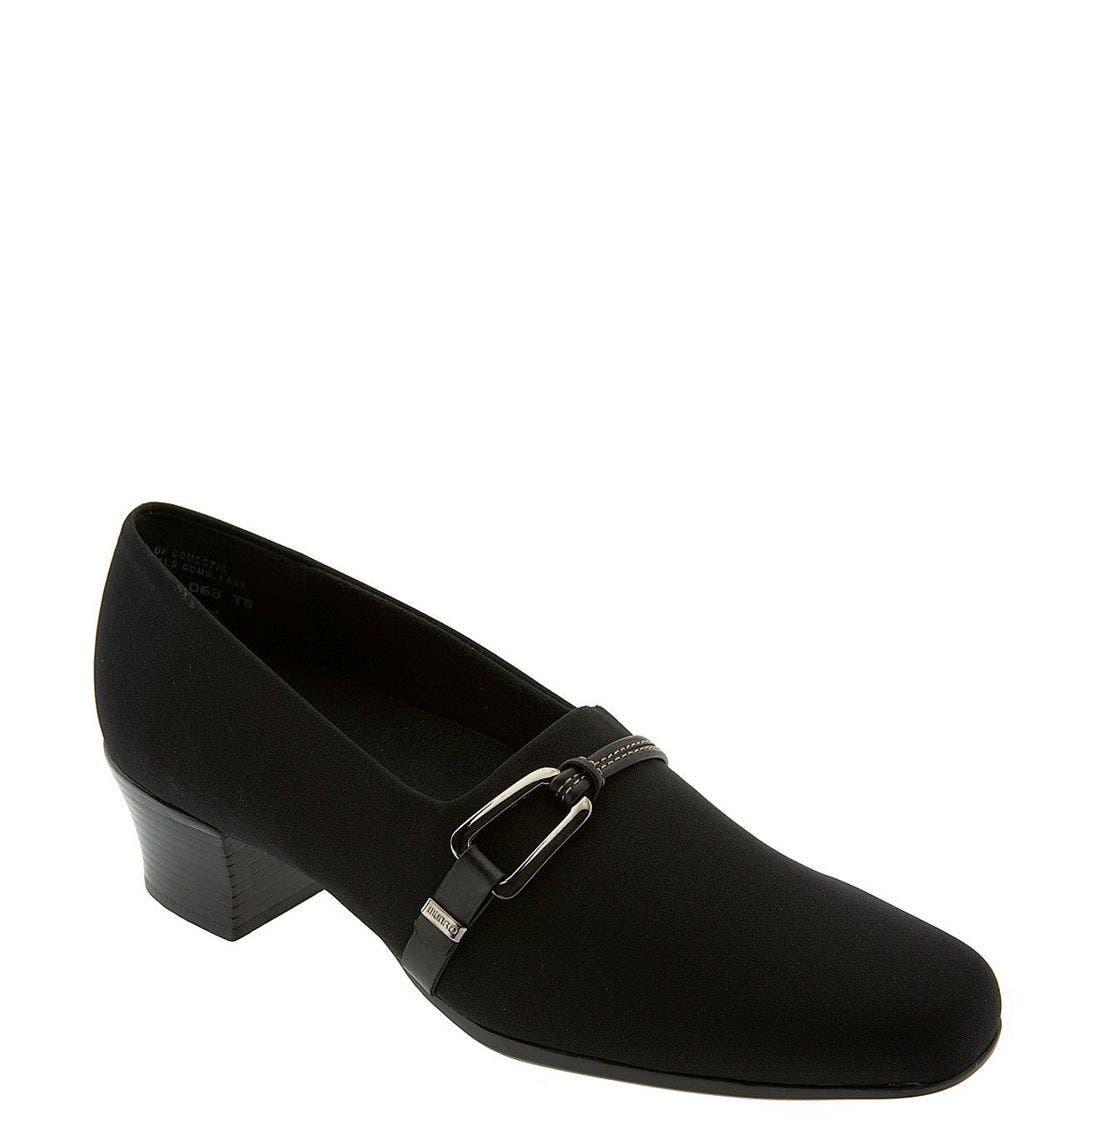 9a1dc8d0e5e Munro Women s Shoes